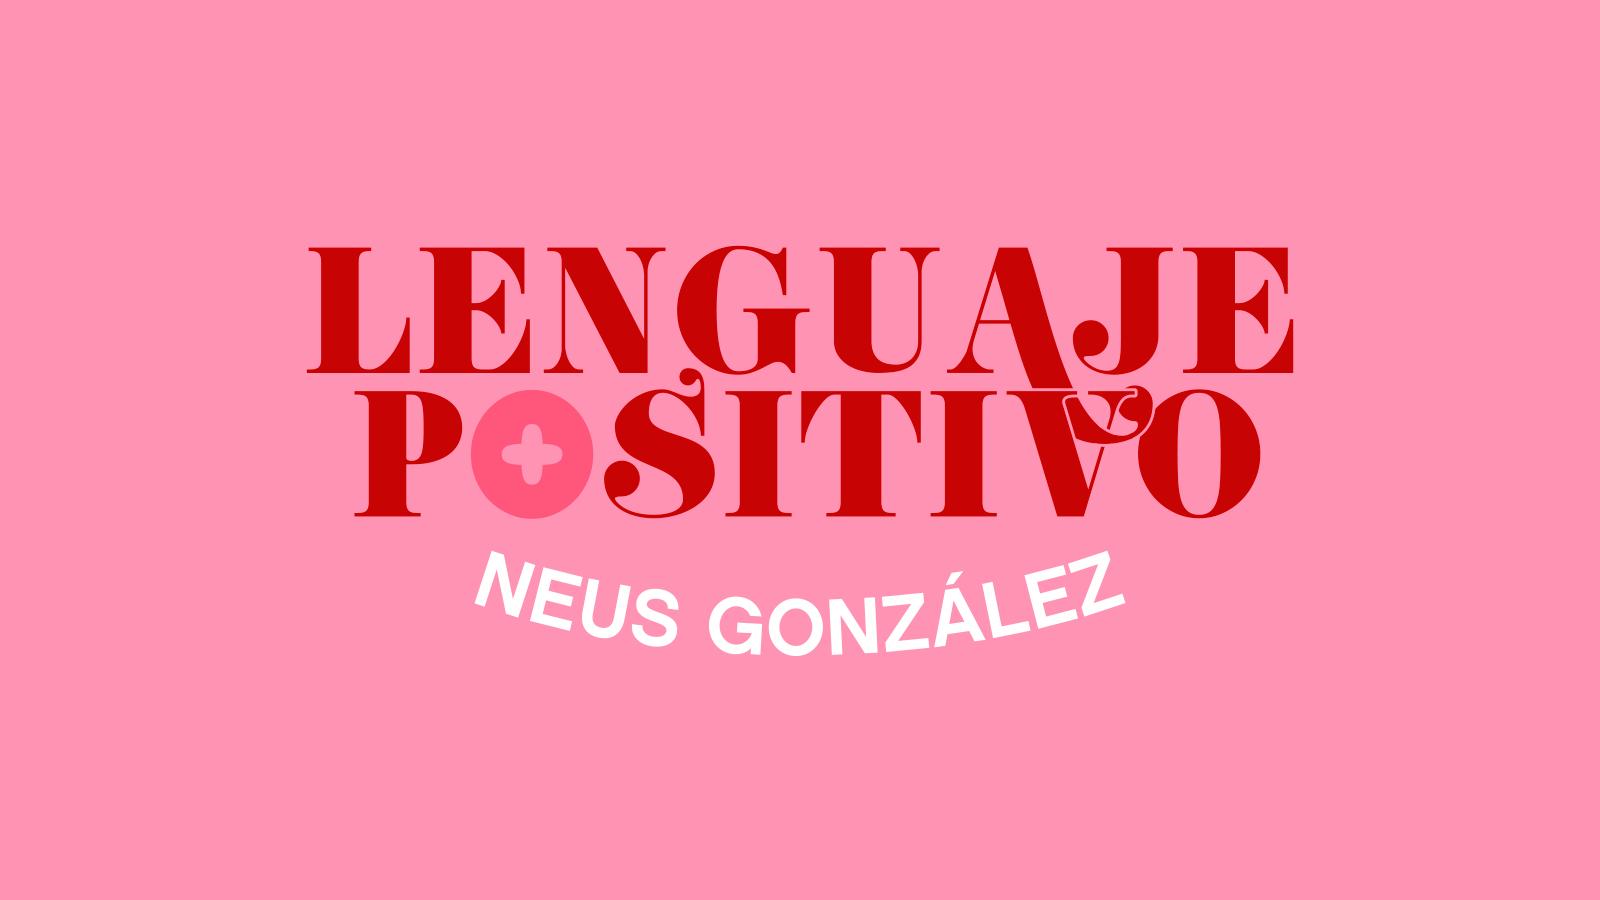 LENGUAJE-POSITIVO_lamadredelosbeatles_logo_1